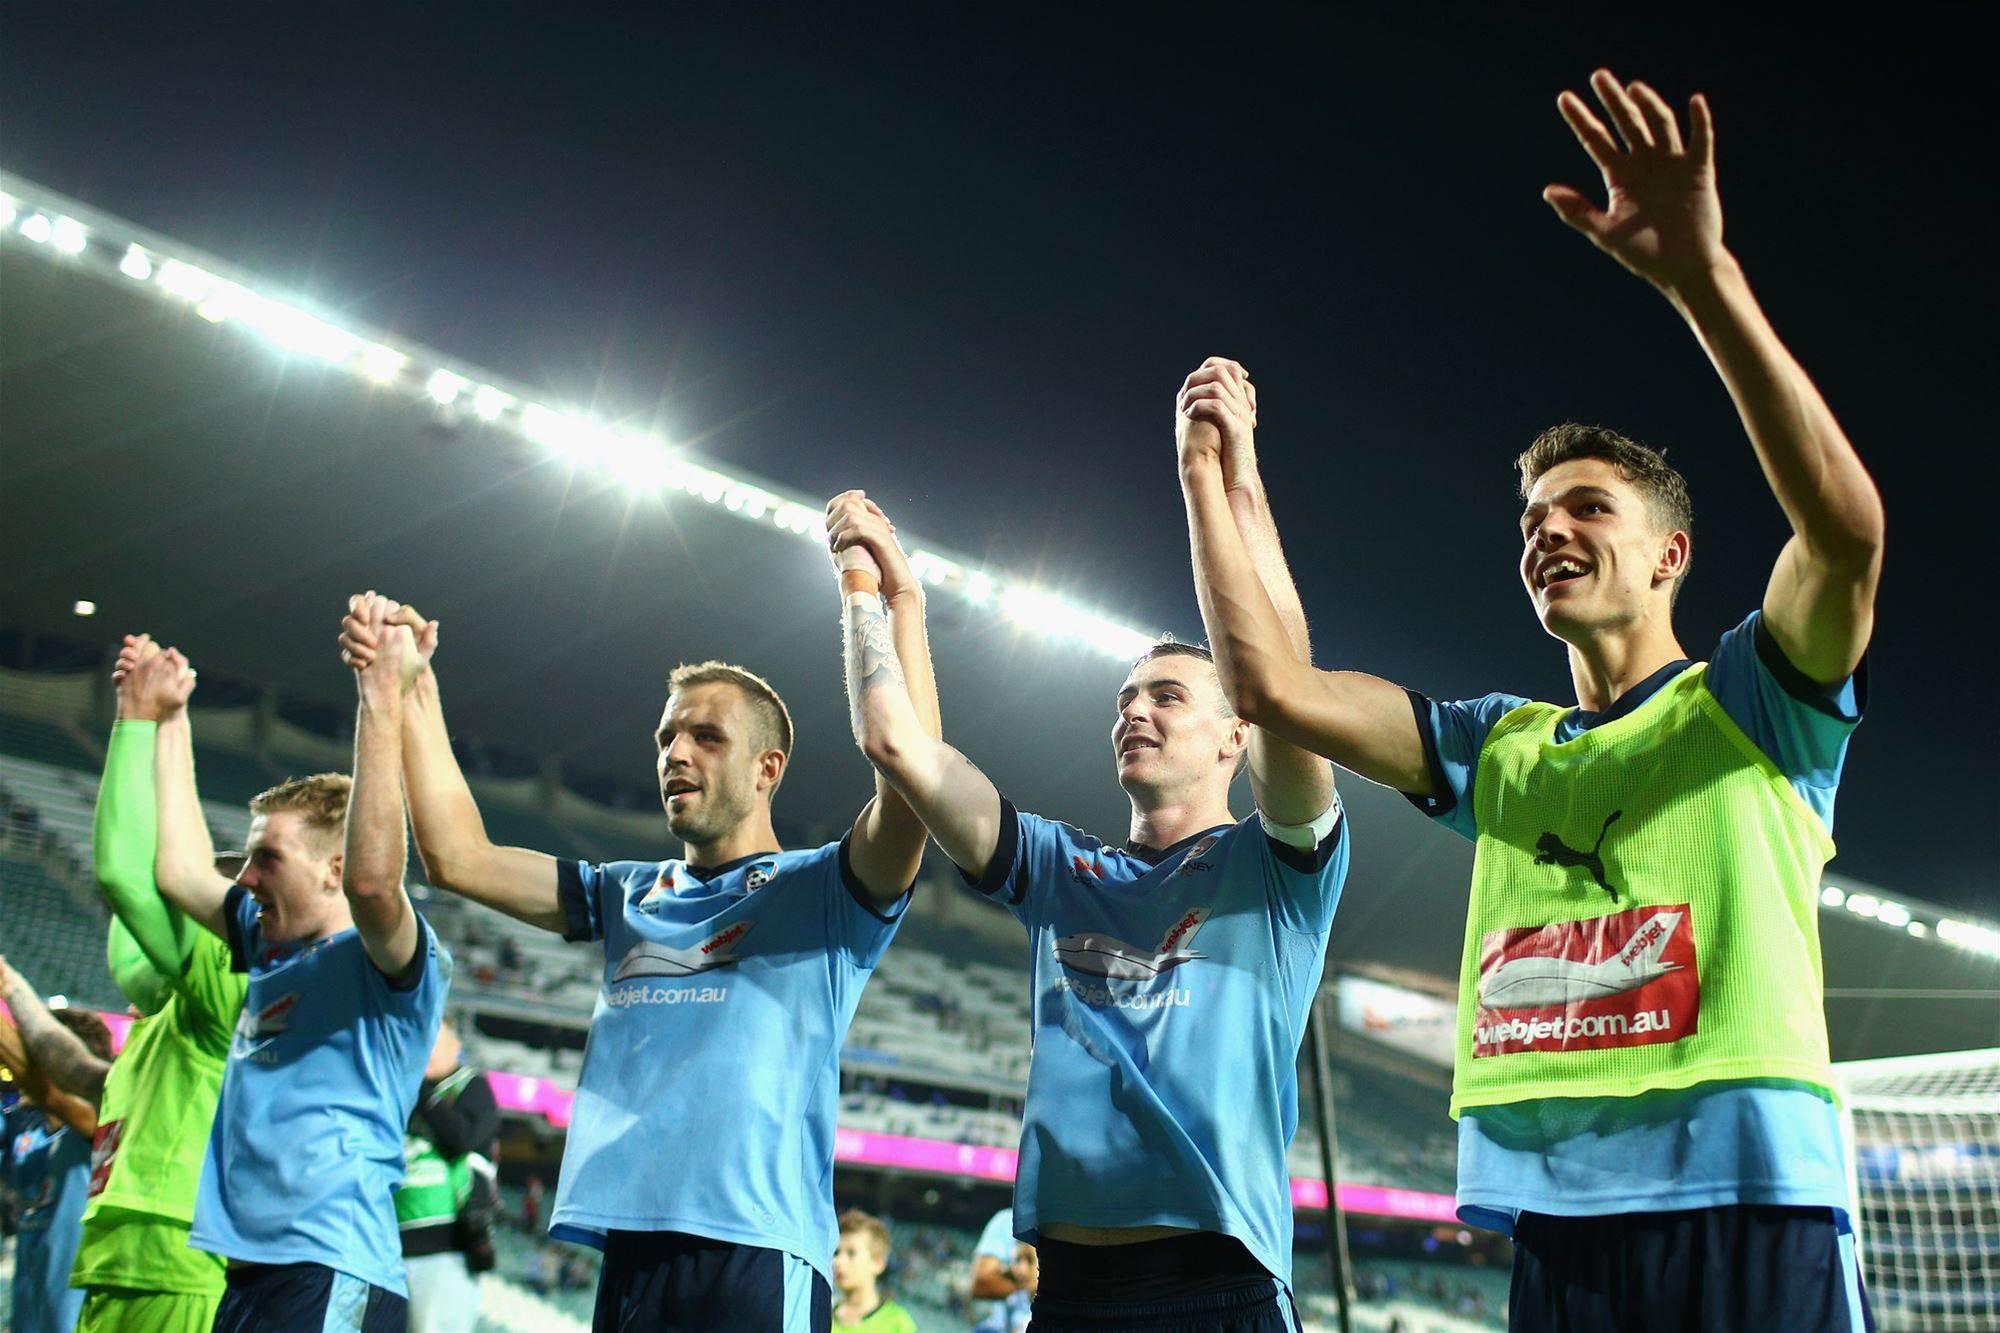 Sydney FC to support Mardi Gras